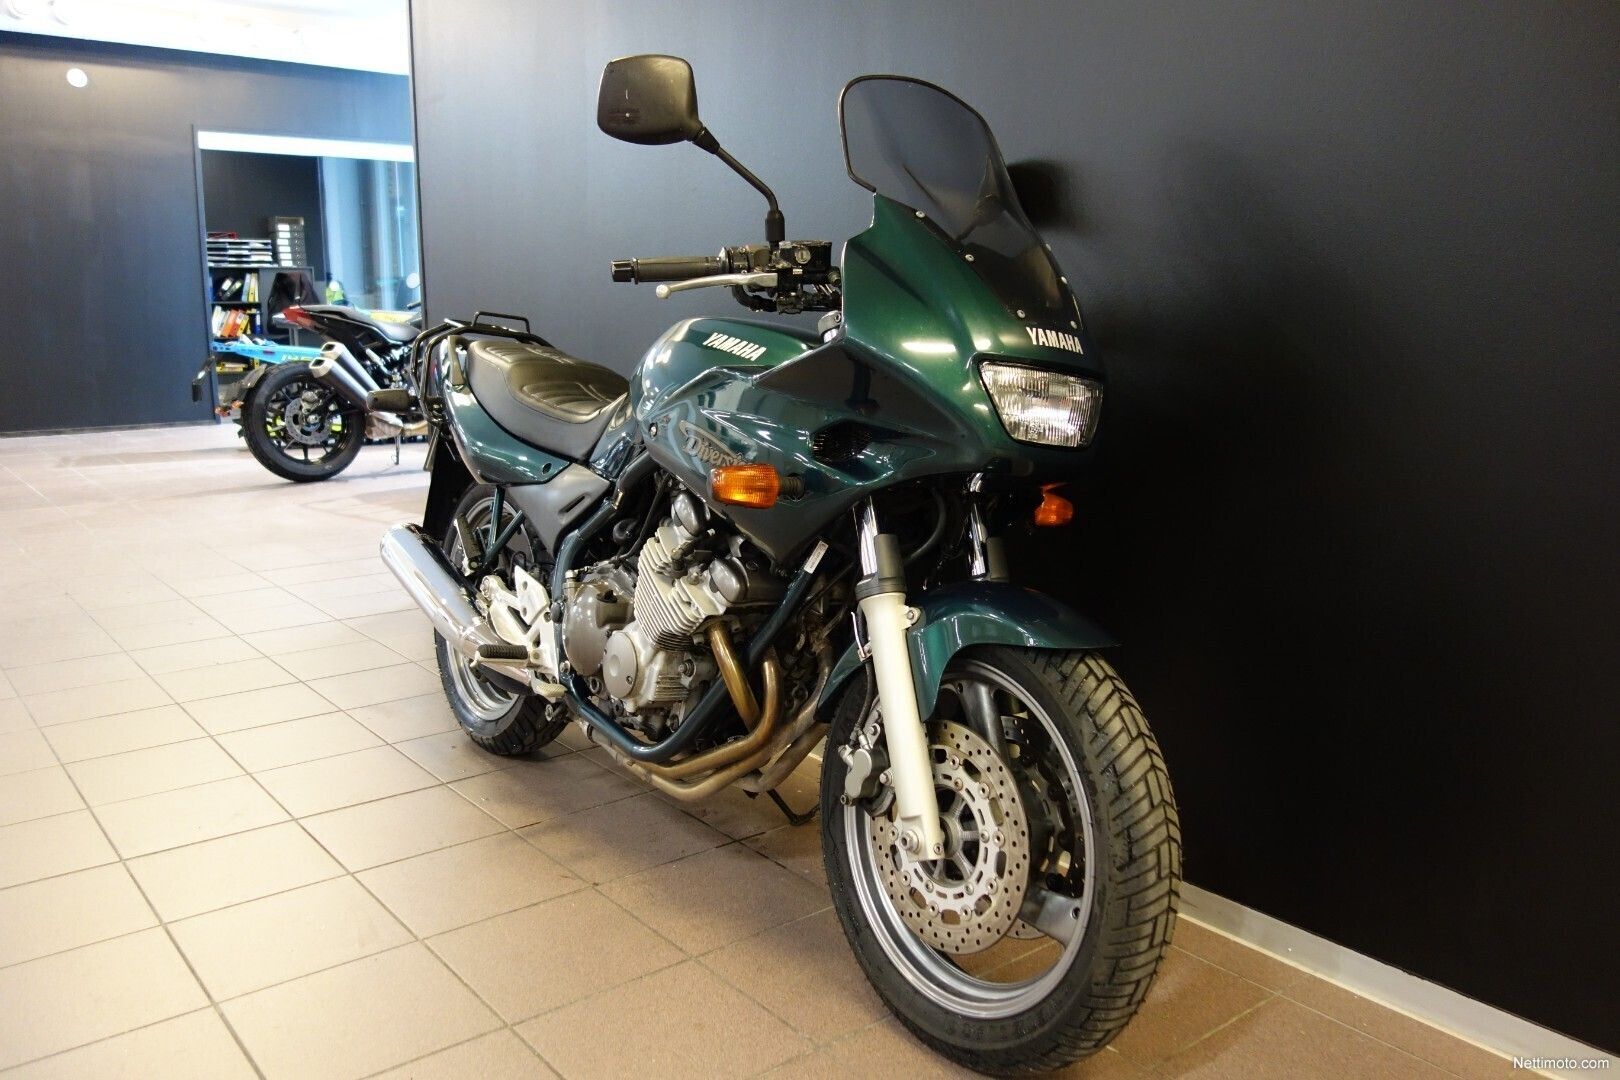 1997 Yamaha XJ600N Cafe Racer - Yamaha XJ 600 N 1997